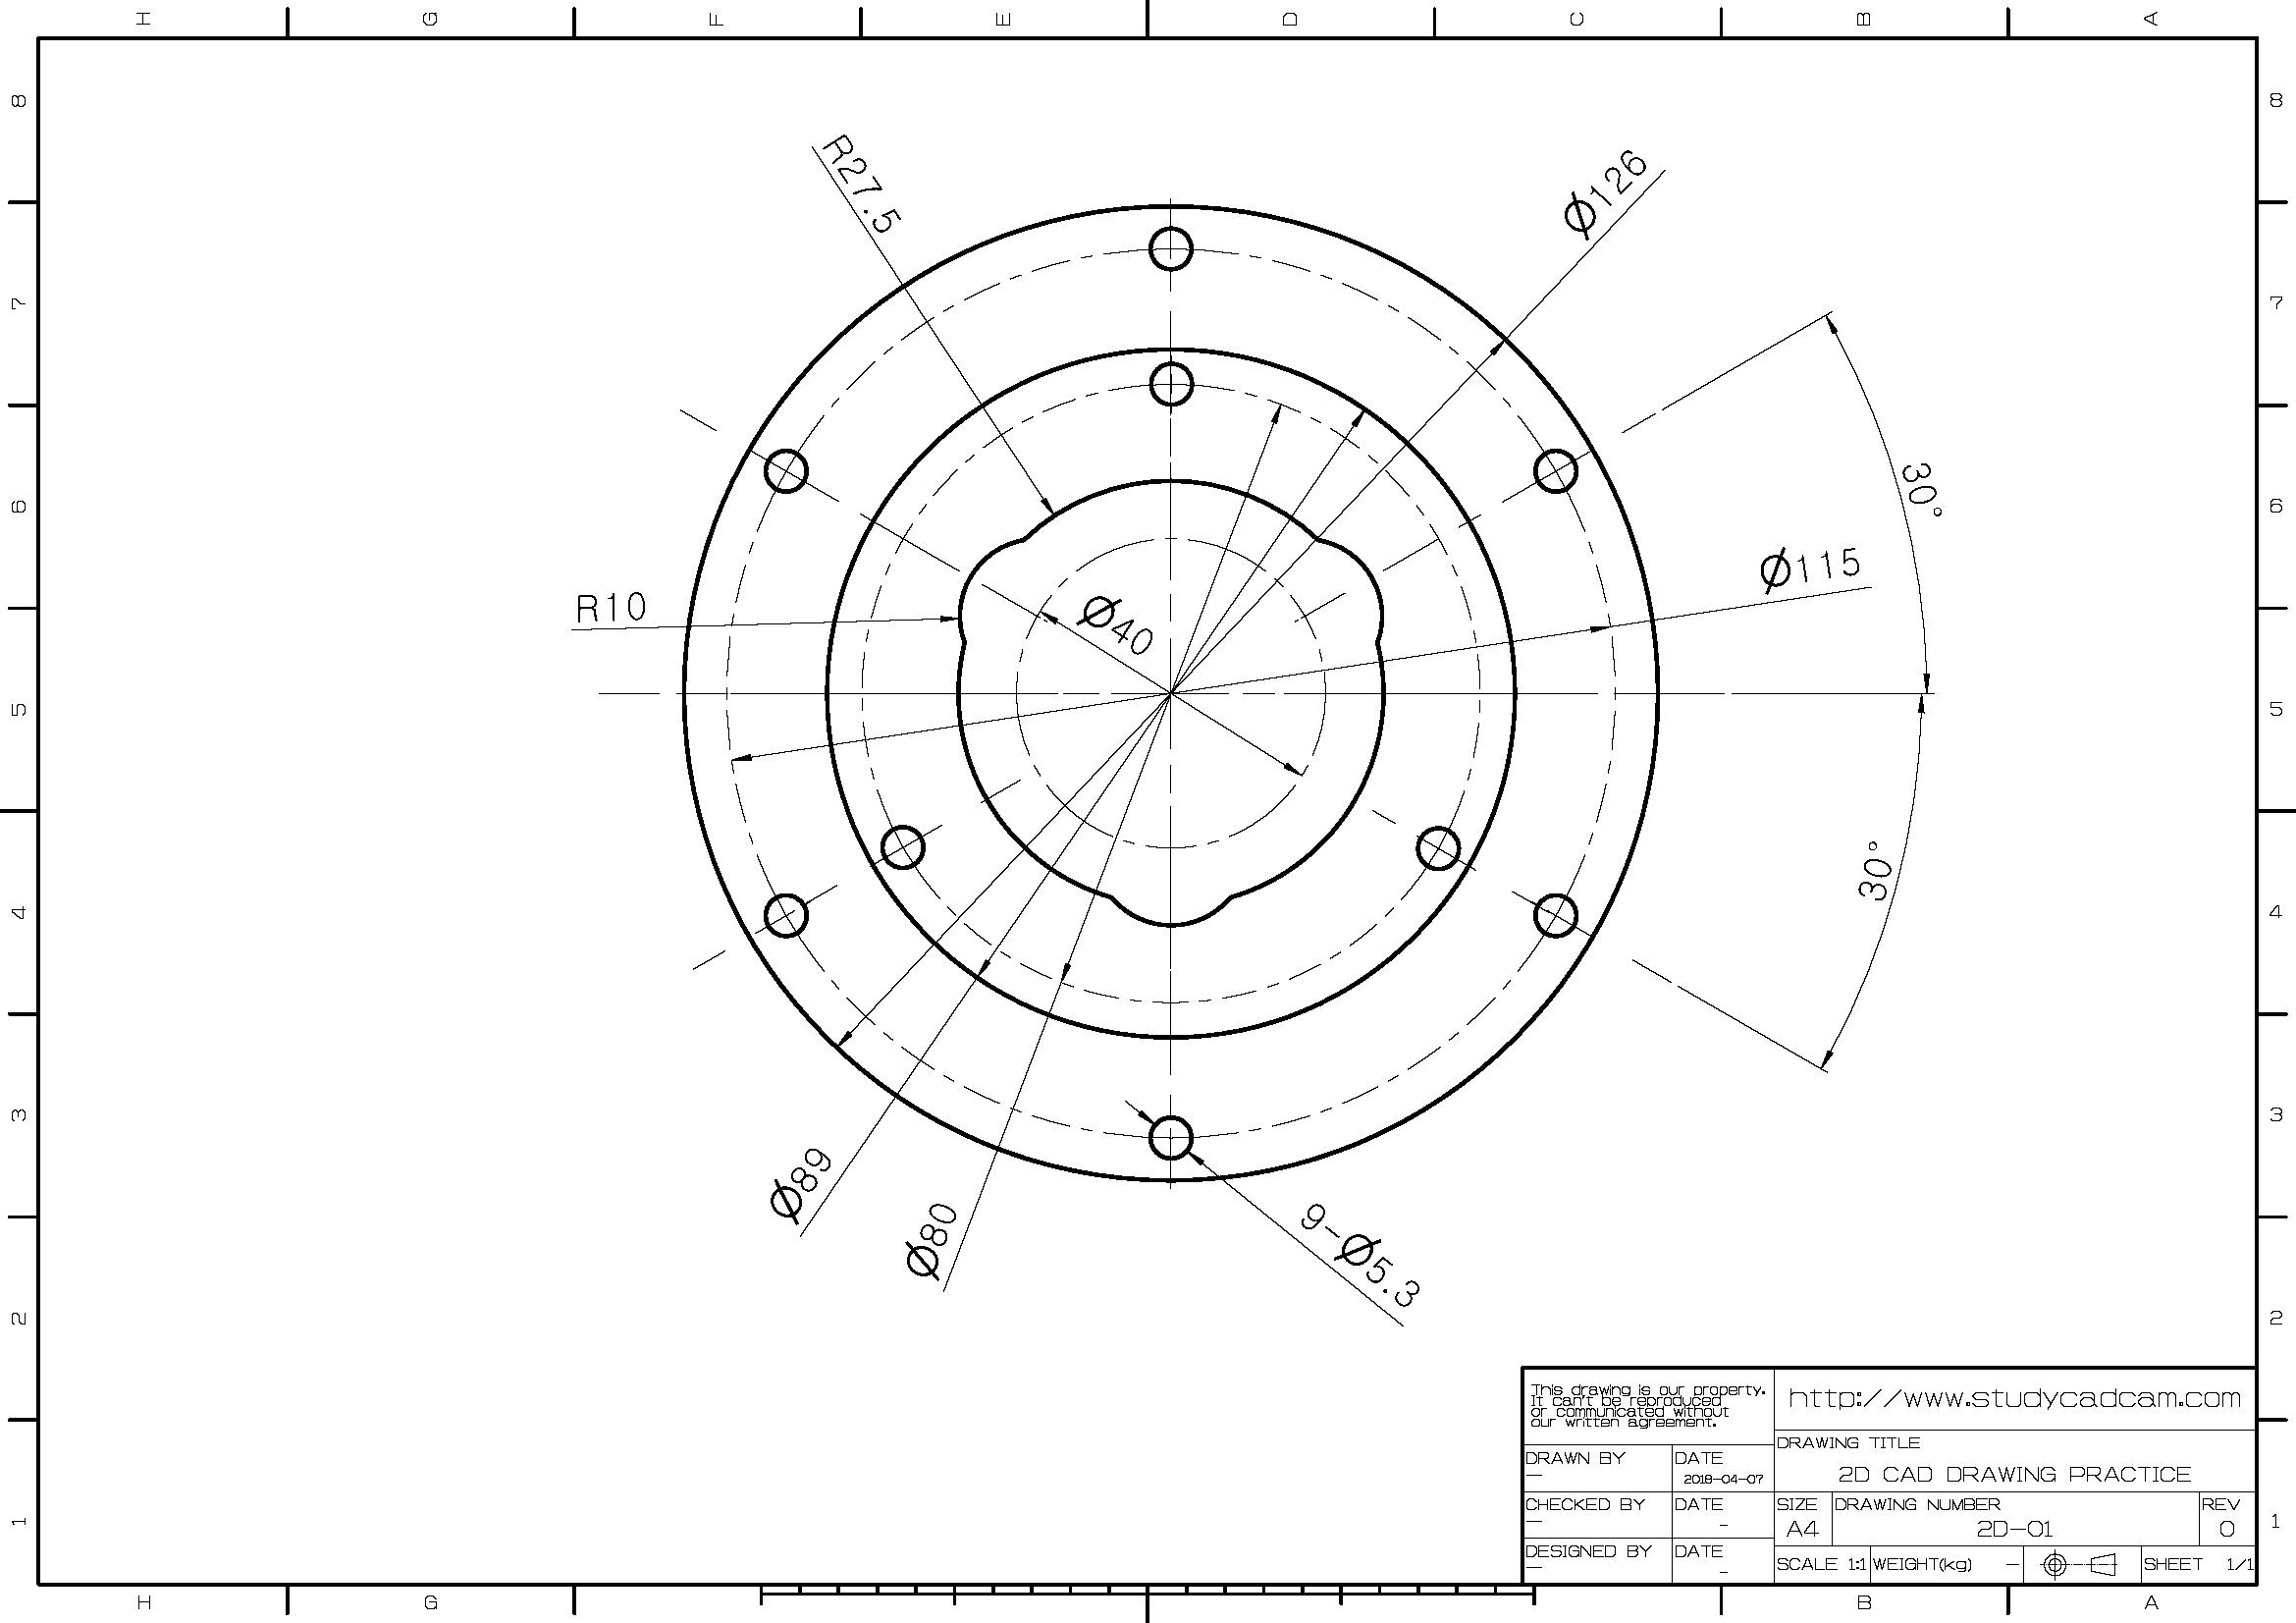 Pin By Al Servicio On 2d Metric Engineering Drawings Autocad Autocad Drawing Bathroom Towel Decor